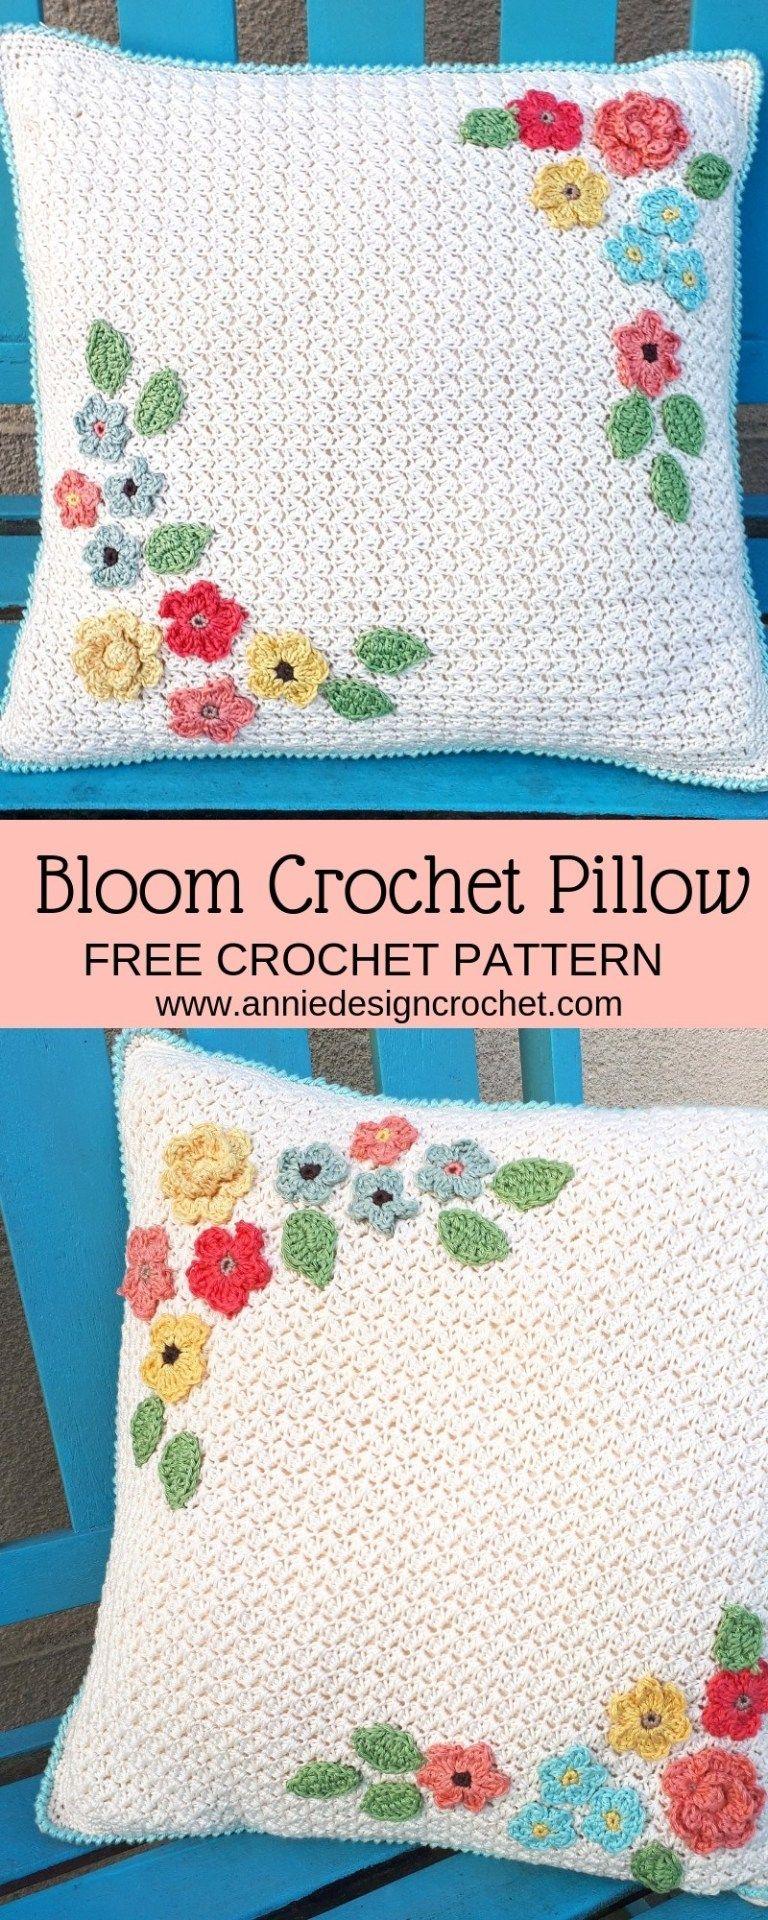 Crochet Annie Potter Presents Baby Bunny Nursery Set crochet pattern